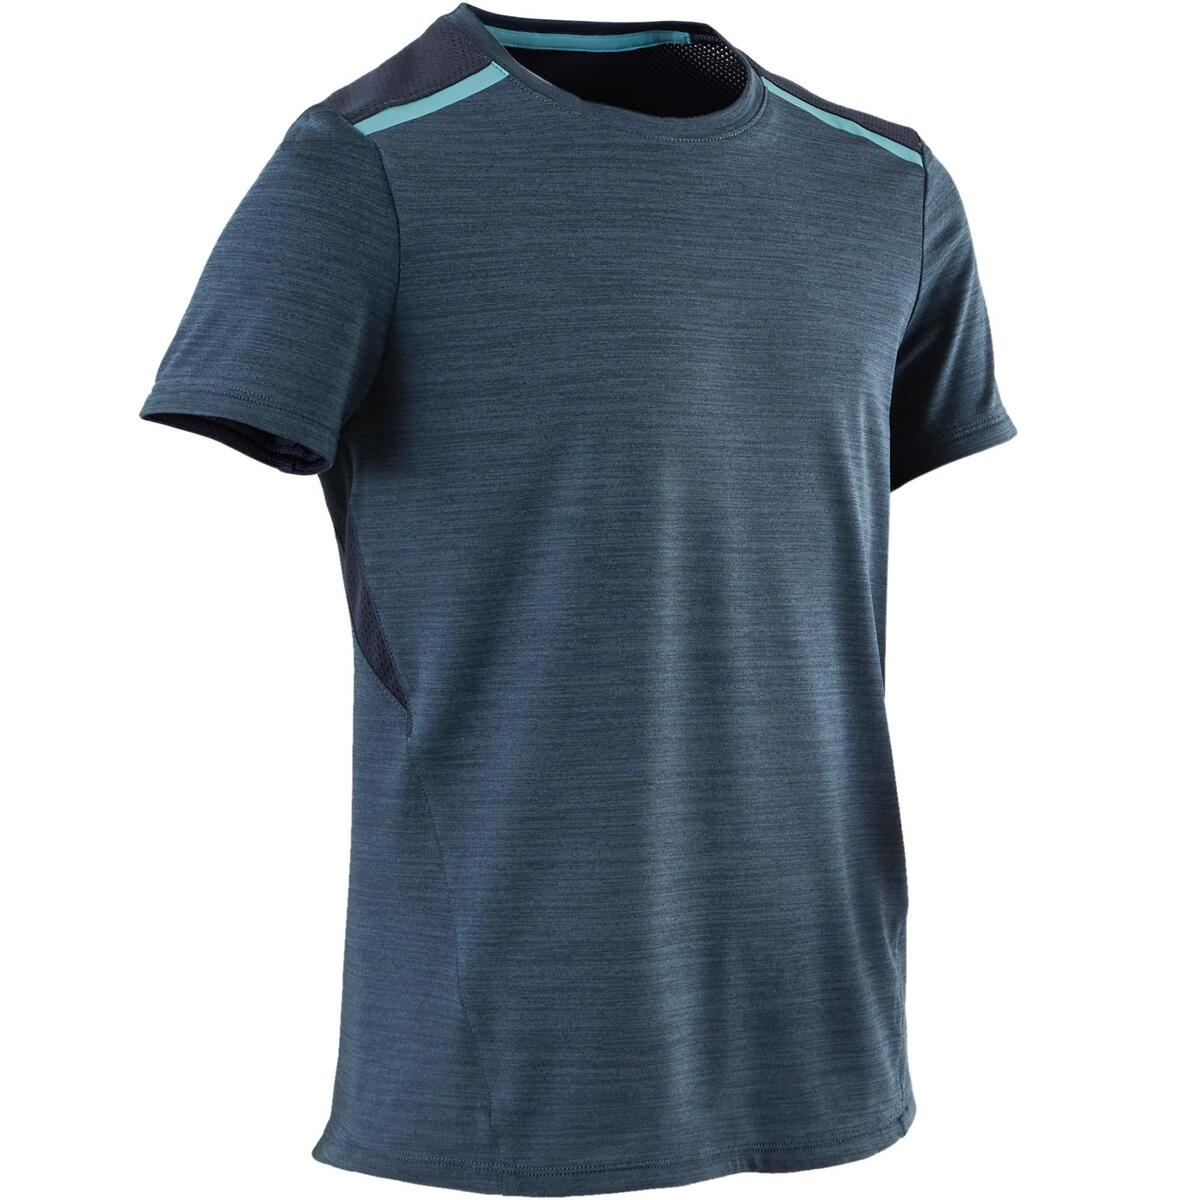 Bild 1 von T-Shirt Synthetik atmungsaktiv S500 Gym Kinder dunkelblau